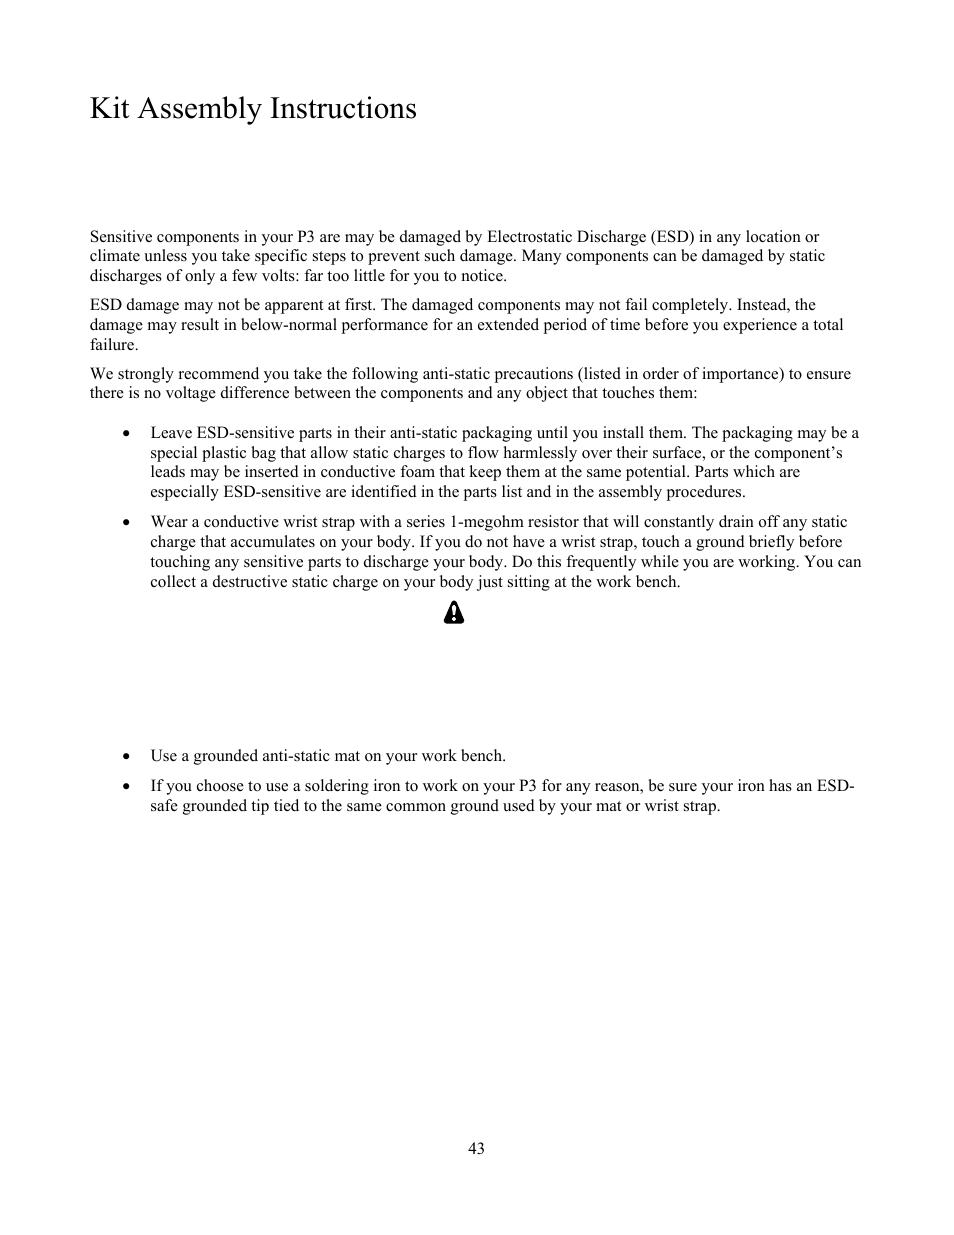 Kit assembly instructions | Elecraft P3 High-Performance Panadapter